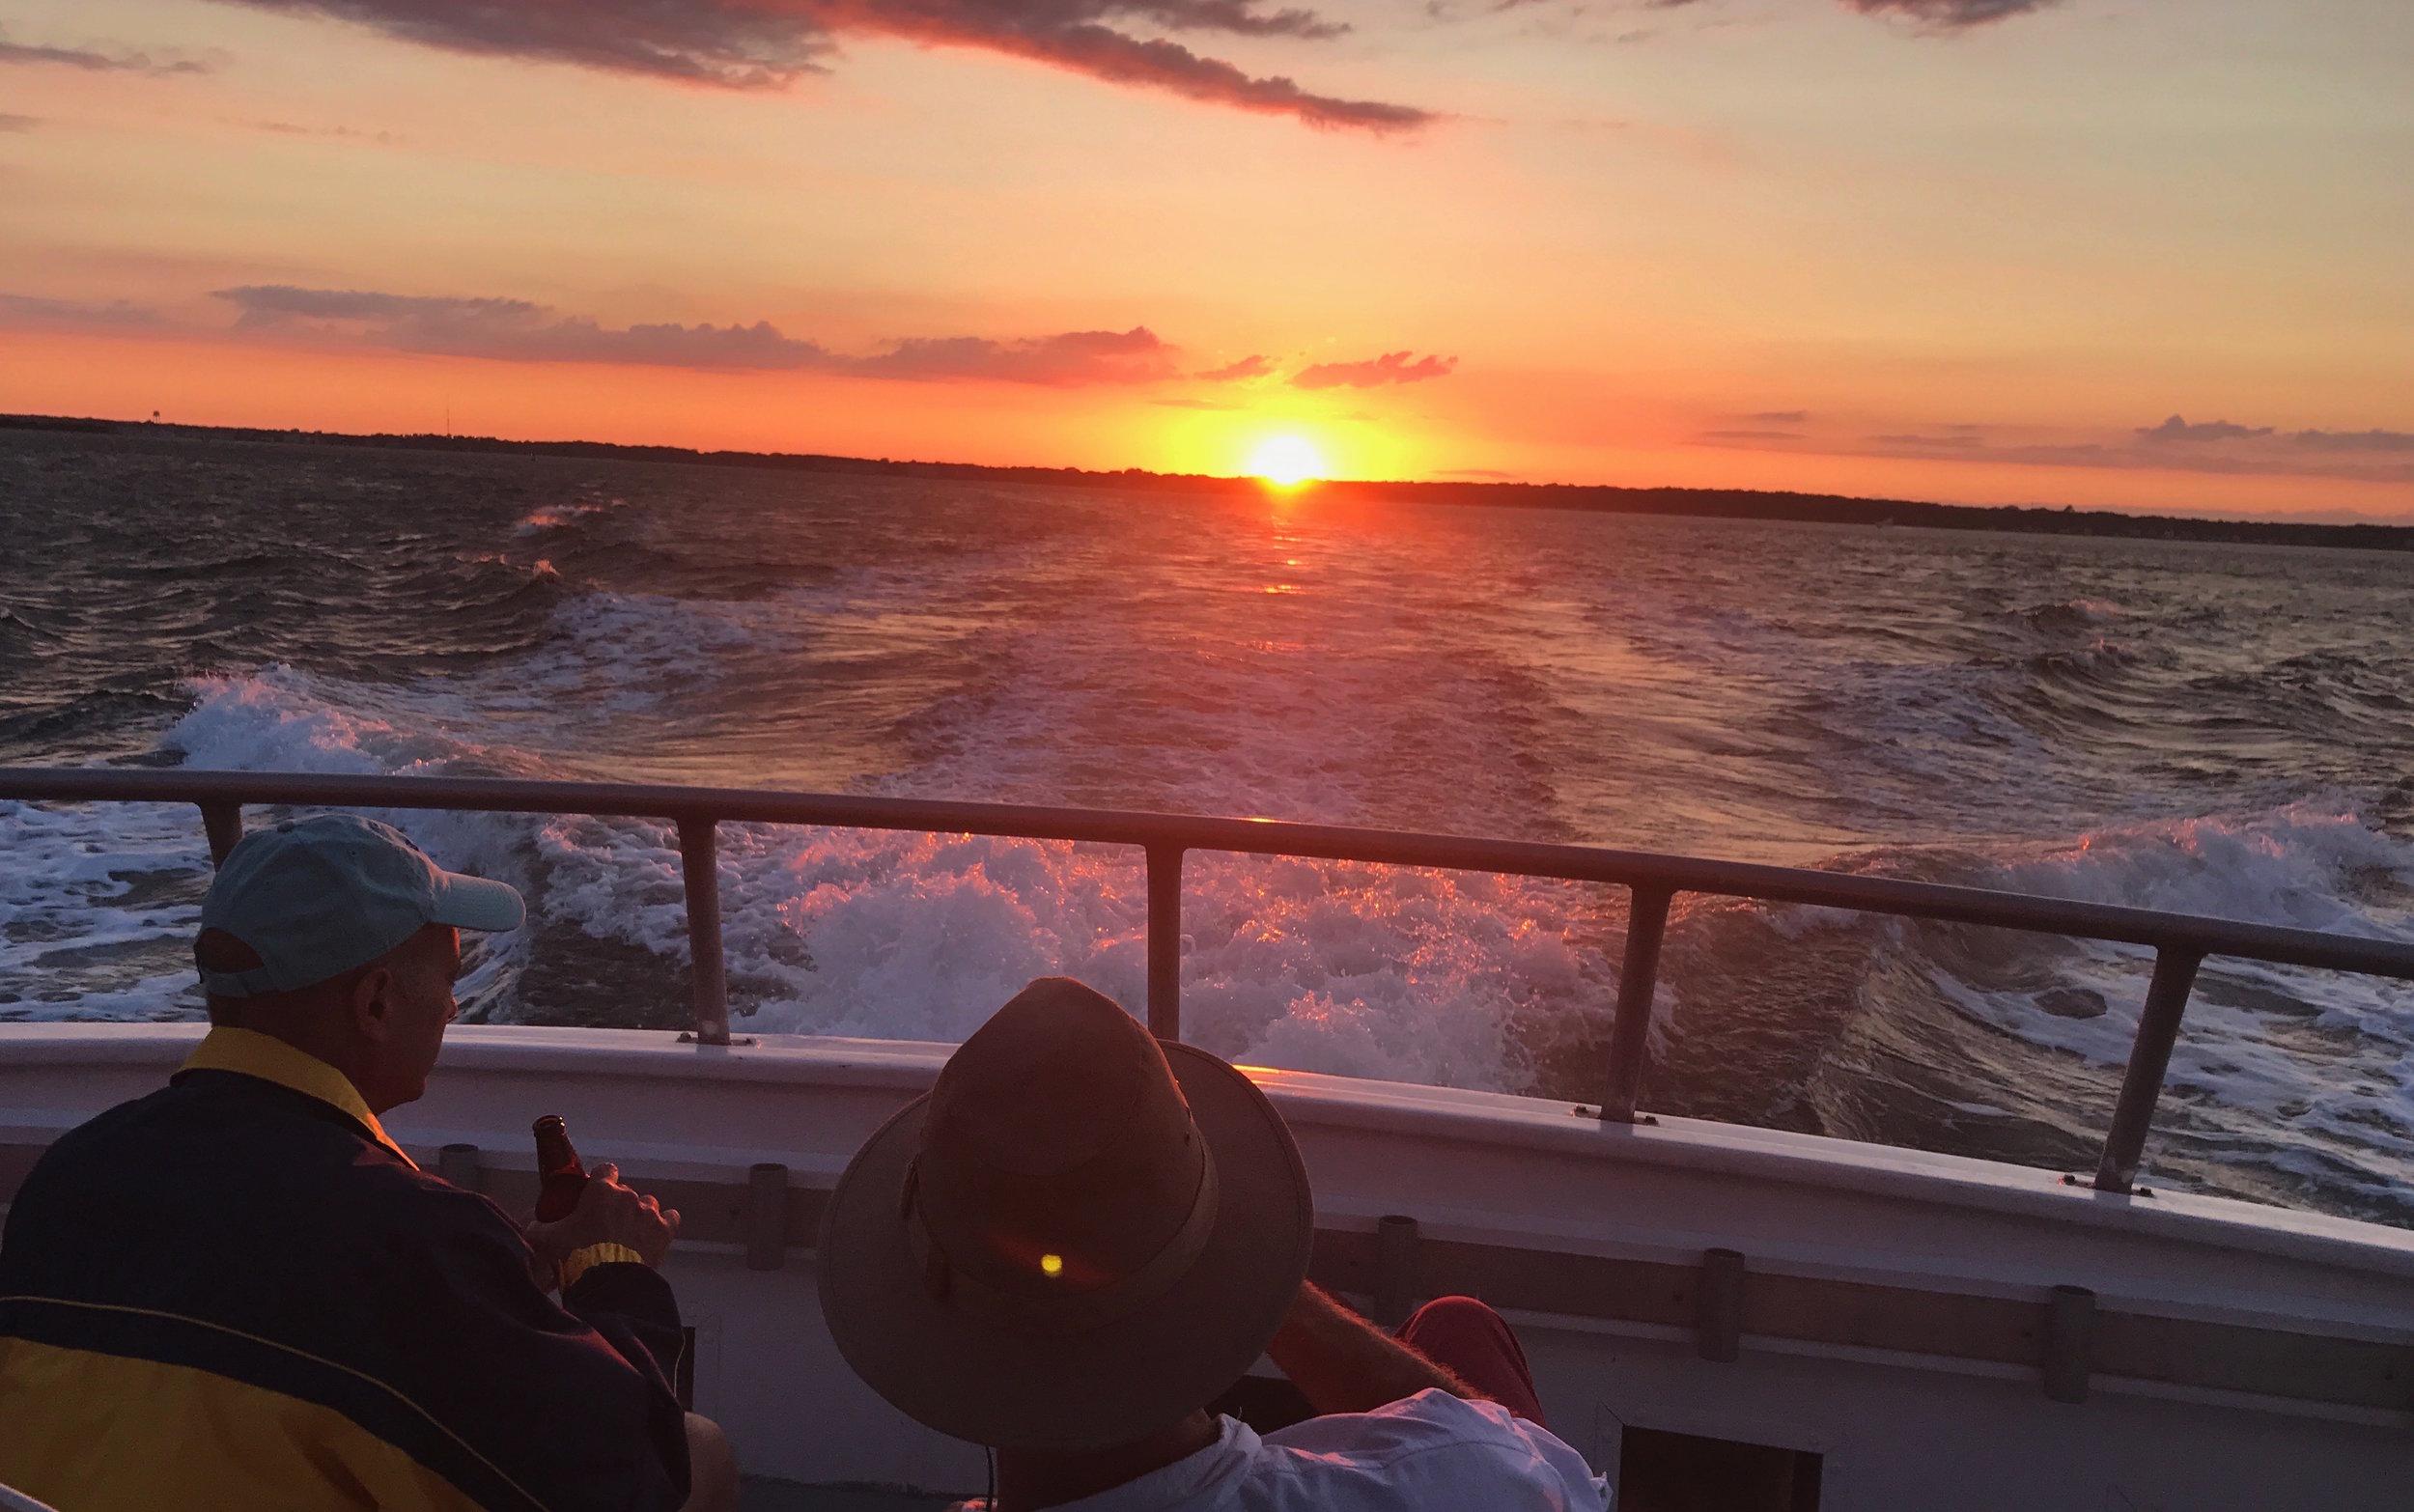 PCL_stern sunset.jpg